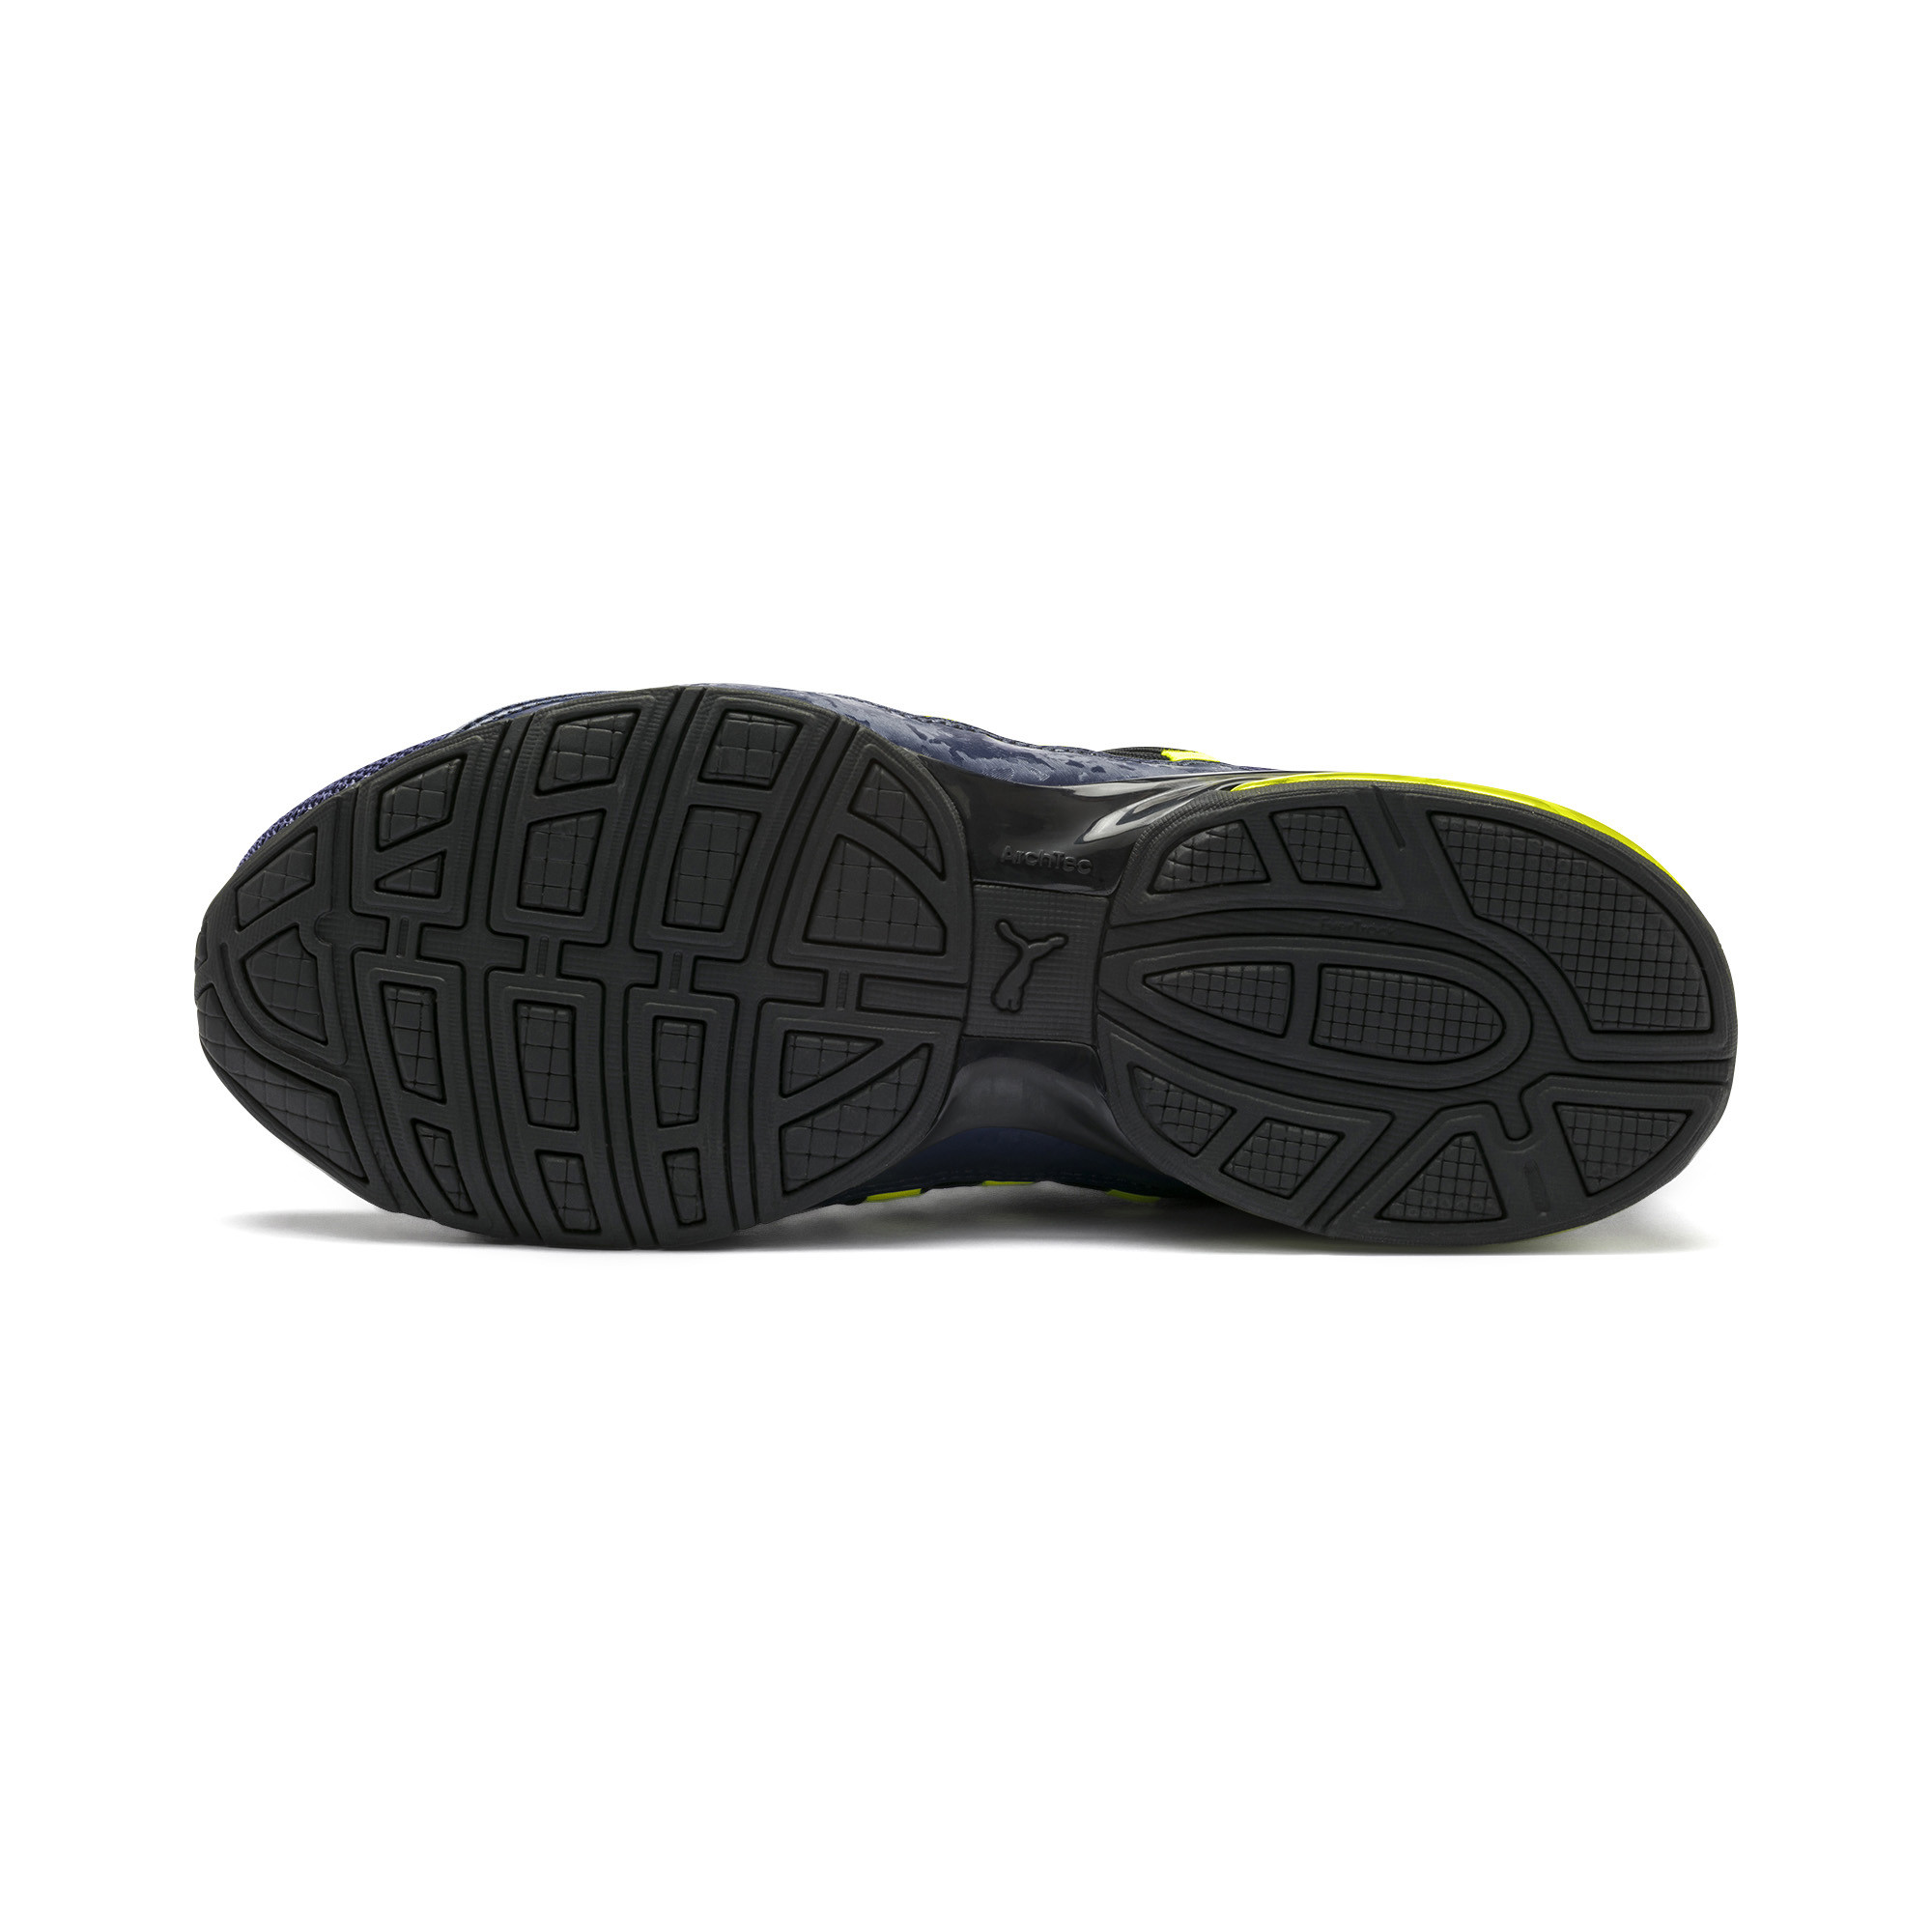 PUMA-CELL-Regulate-Camo-Men-s-Training-Shoes-Men-Shoe-Running thumbnail 13